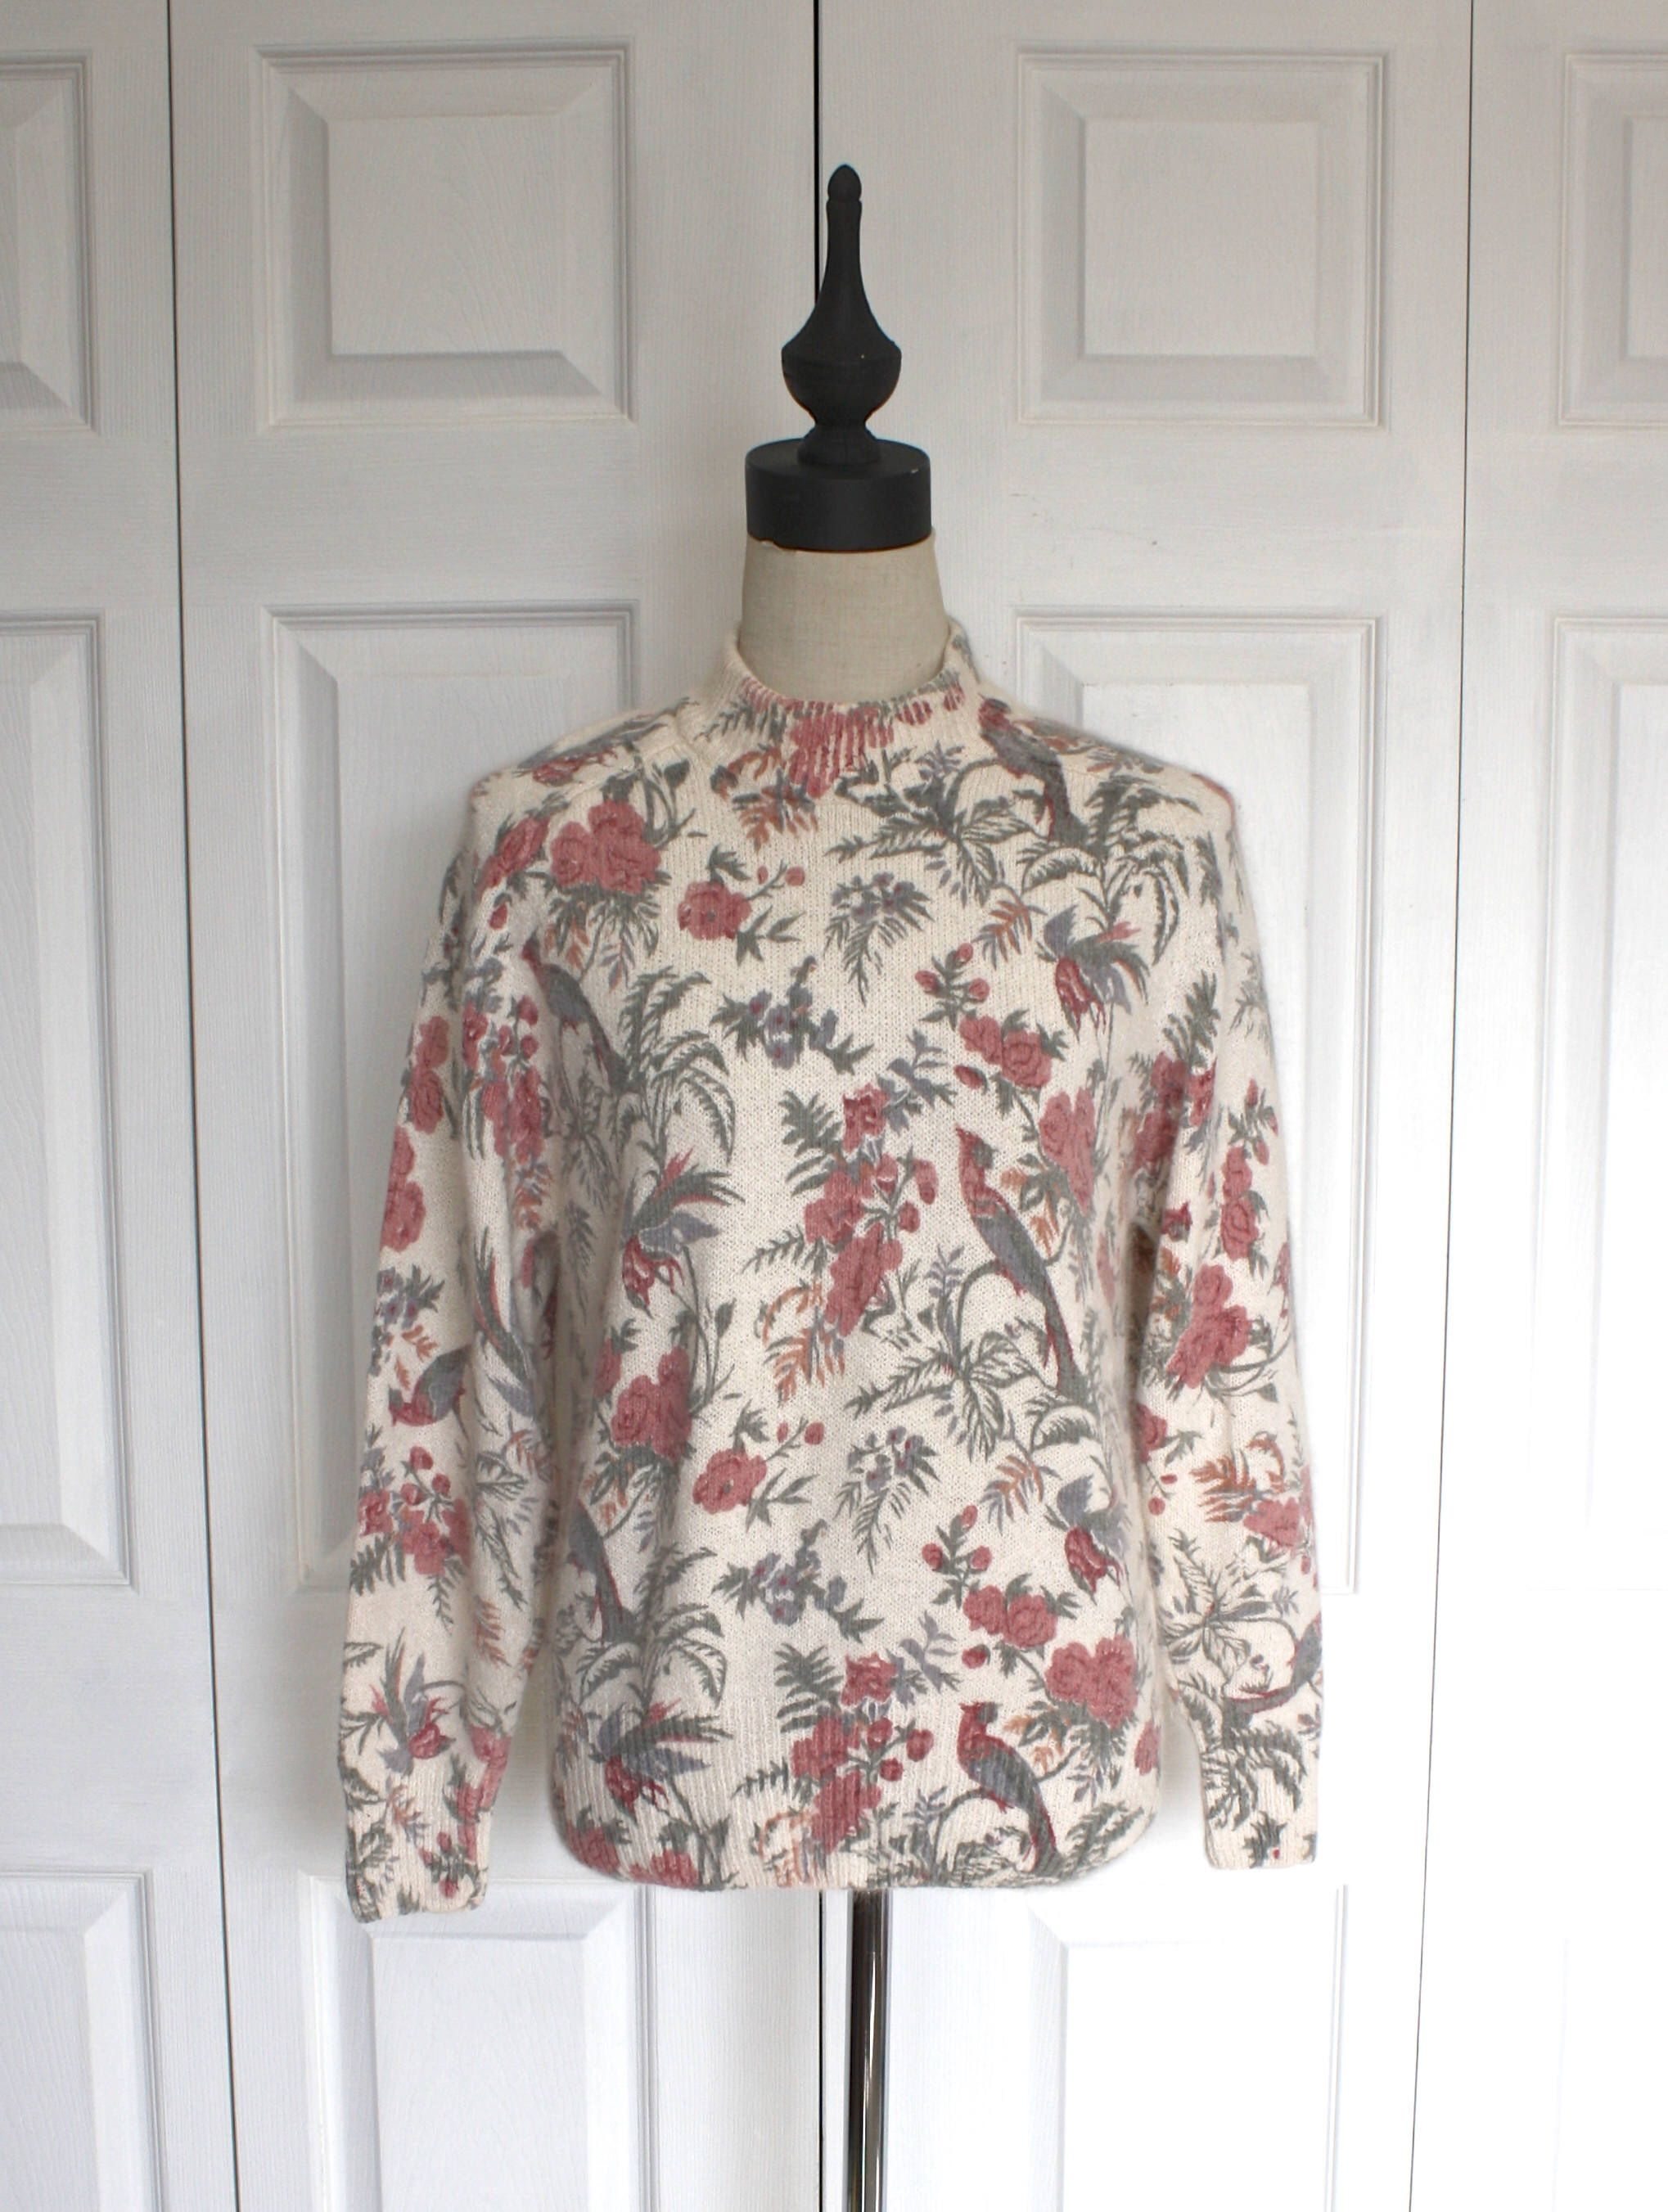 84c500d79c842 Vintage SILK ANGORA Sweater . 1980s 90s Ivory Floral Turtleneck Pullover  Sweater Jumper . Size Large or Oversize Medium